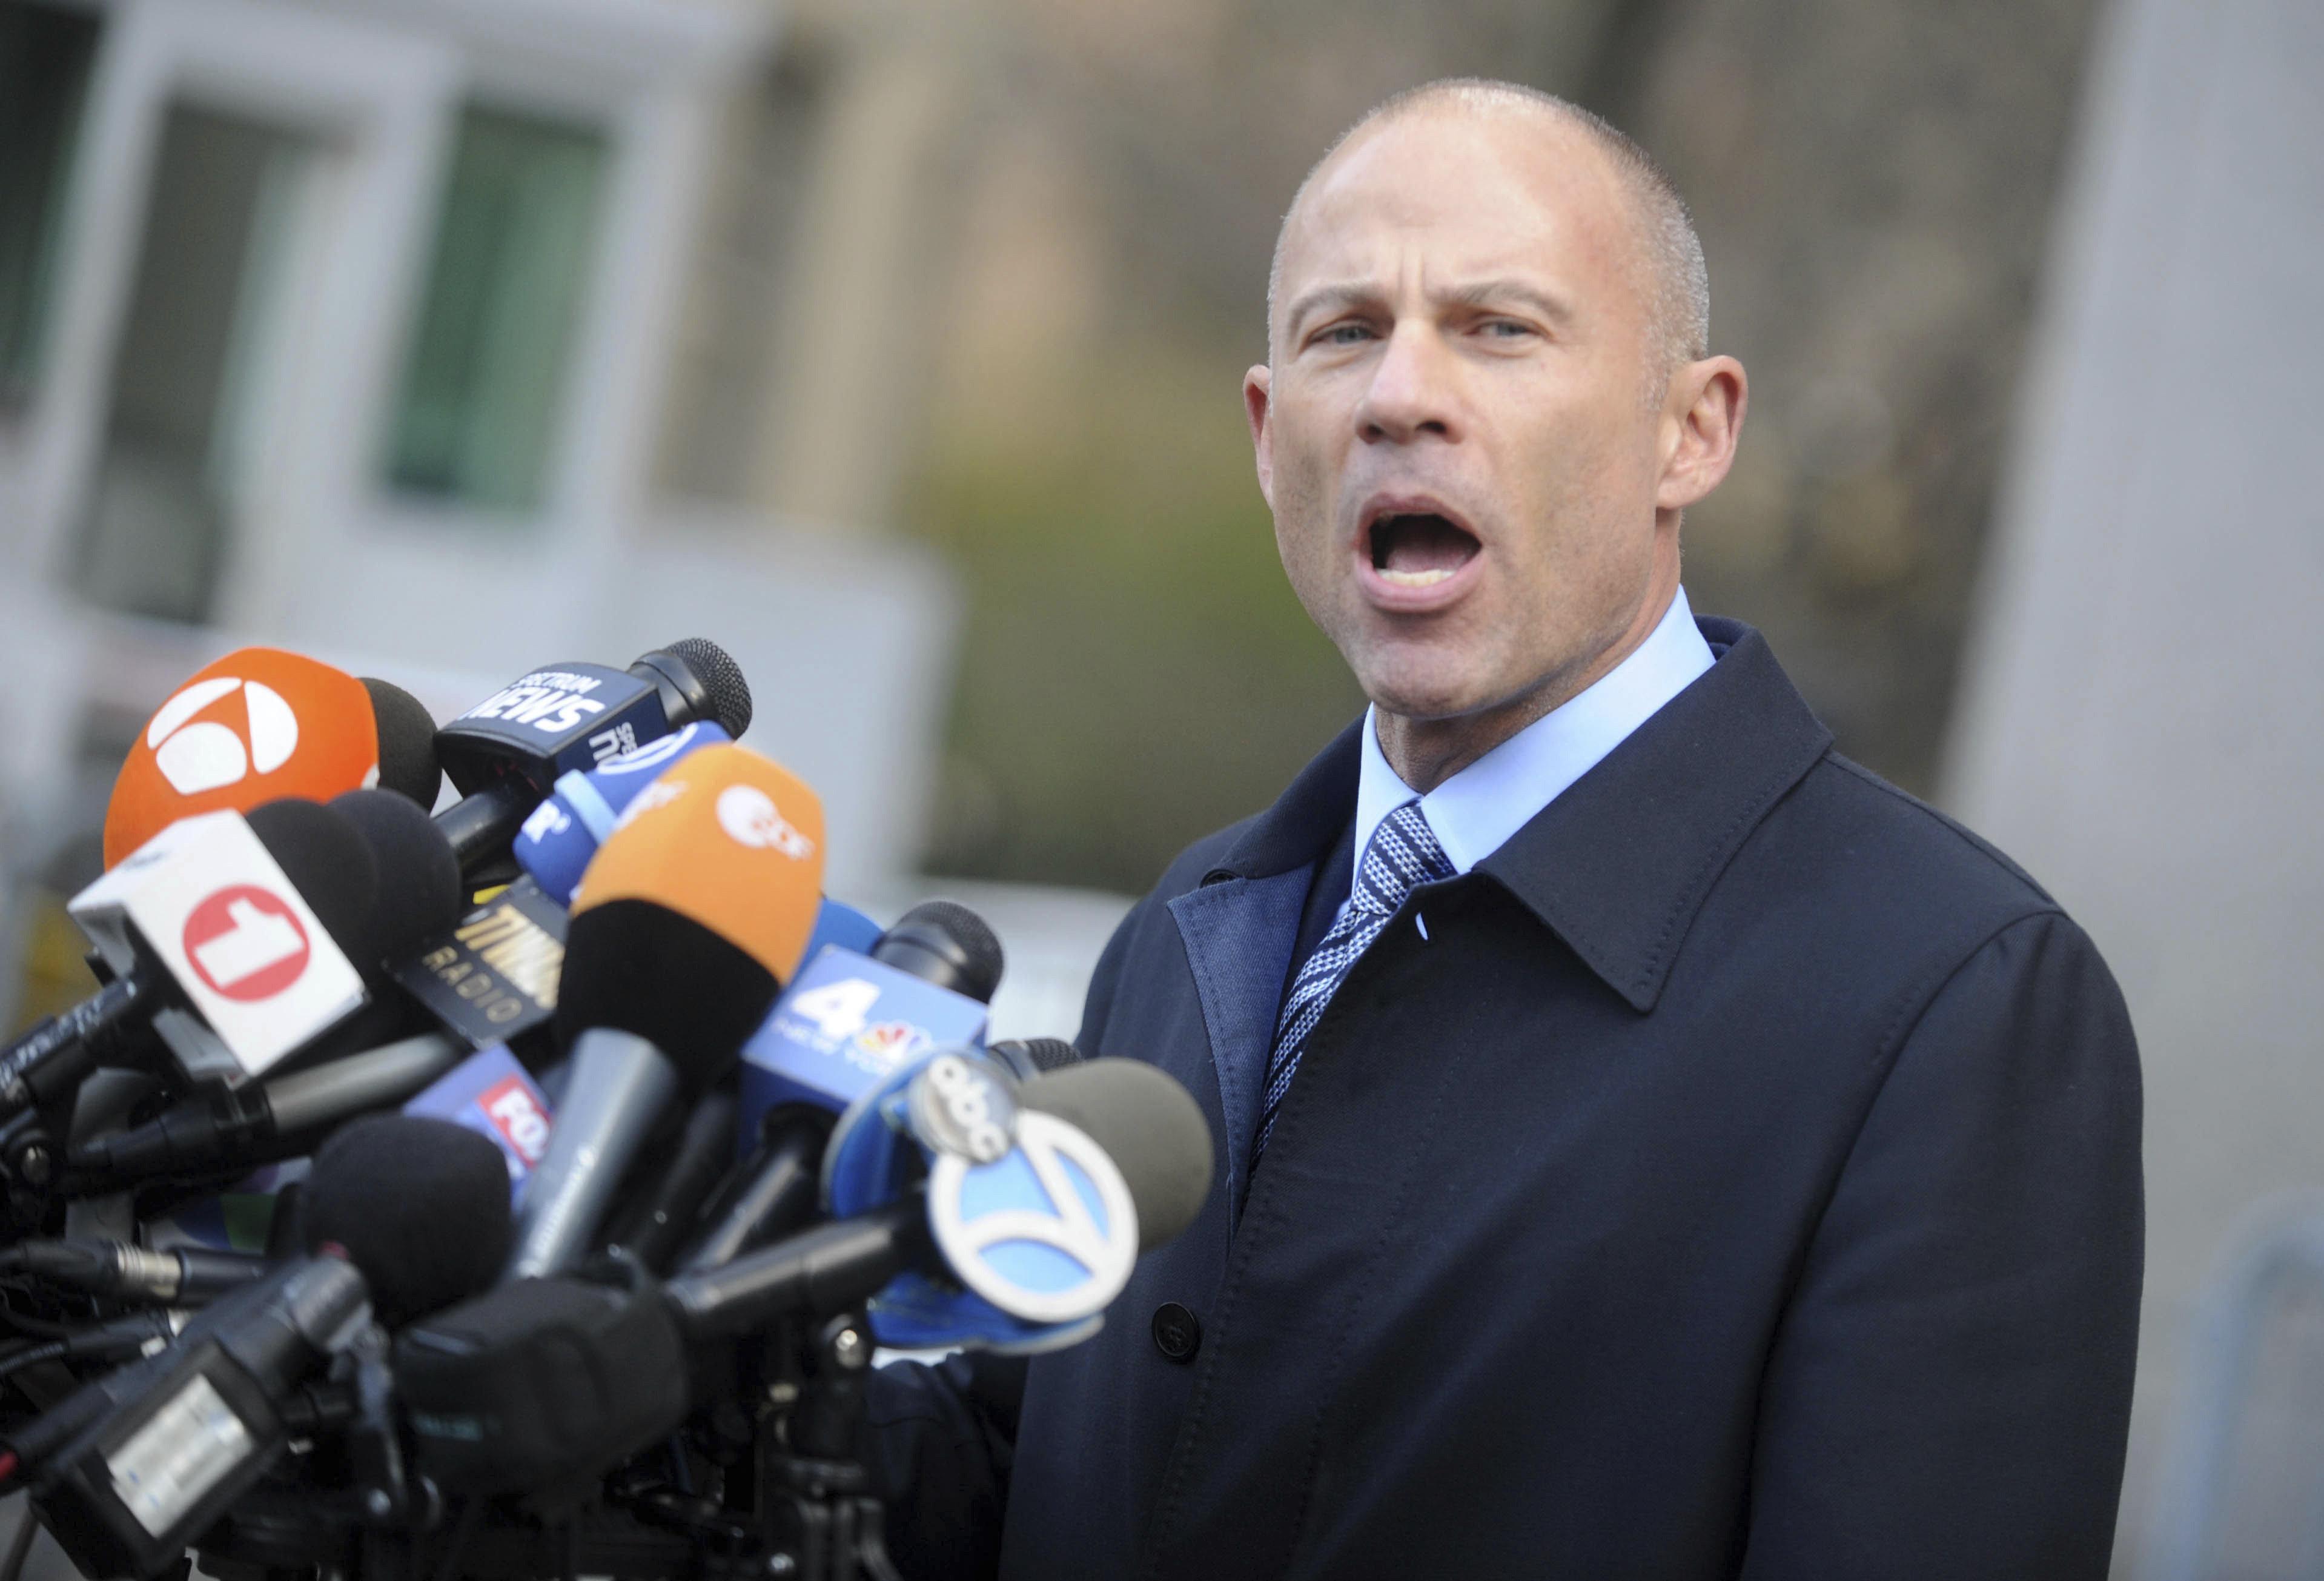 Michael Avenatti Says He Won't Run For President After